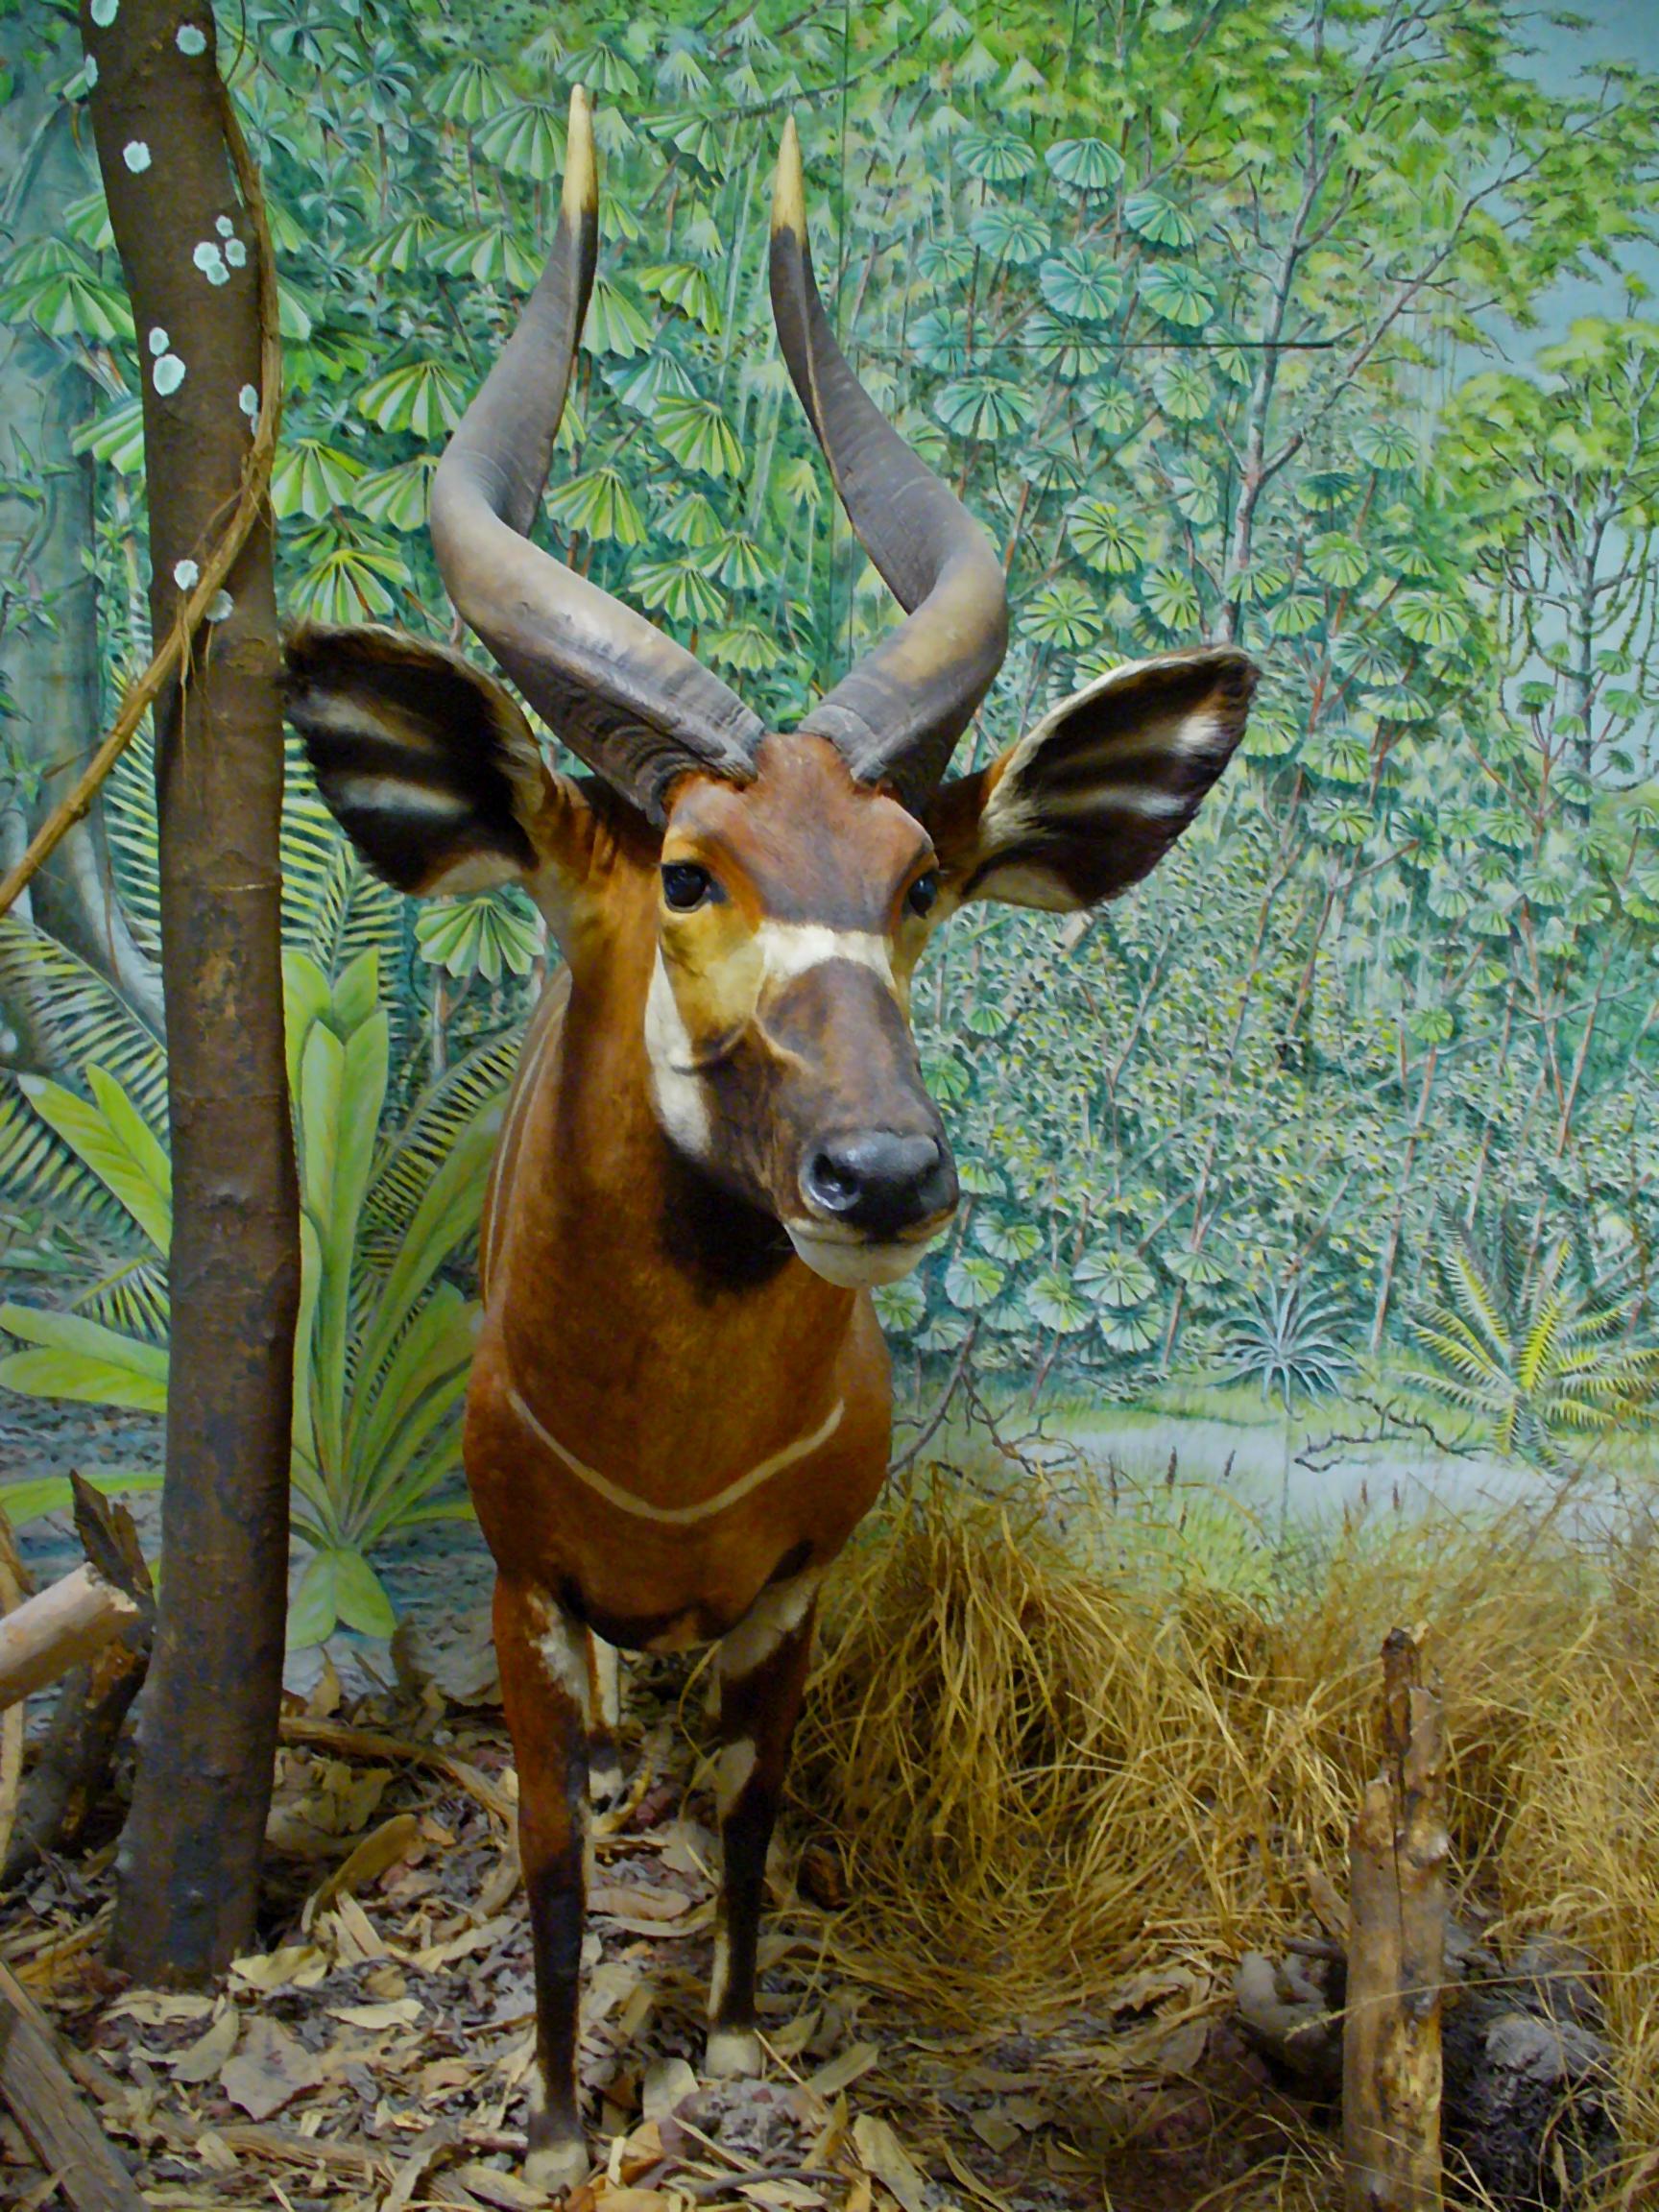 Tragelaphus eurycerus, Bovidae, Western Bongo, Lowland Bongo; Staatliches Museum für Naturkunde Karlsruhe, Germany. Photo taken on August 2, 2009.